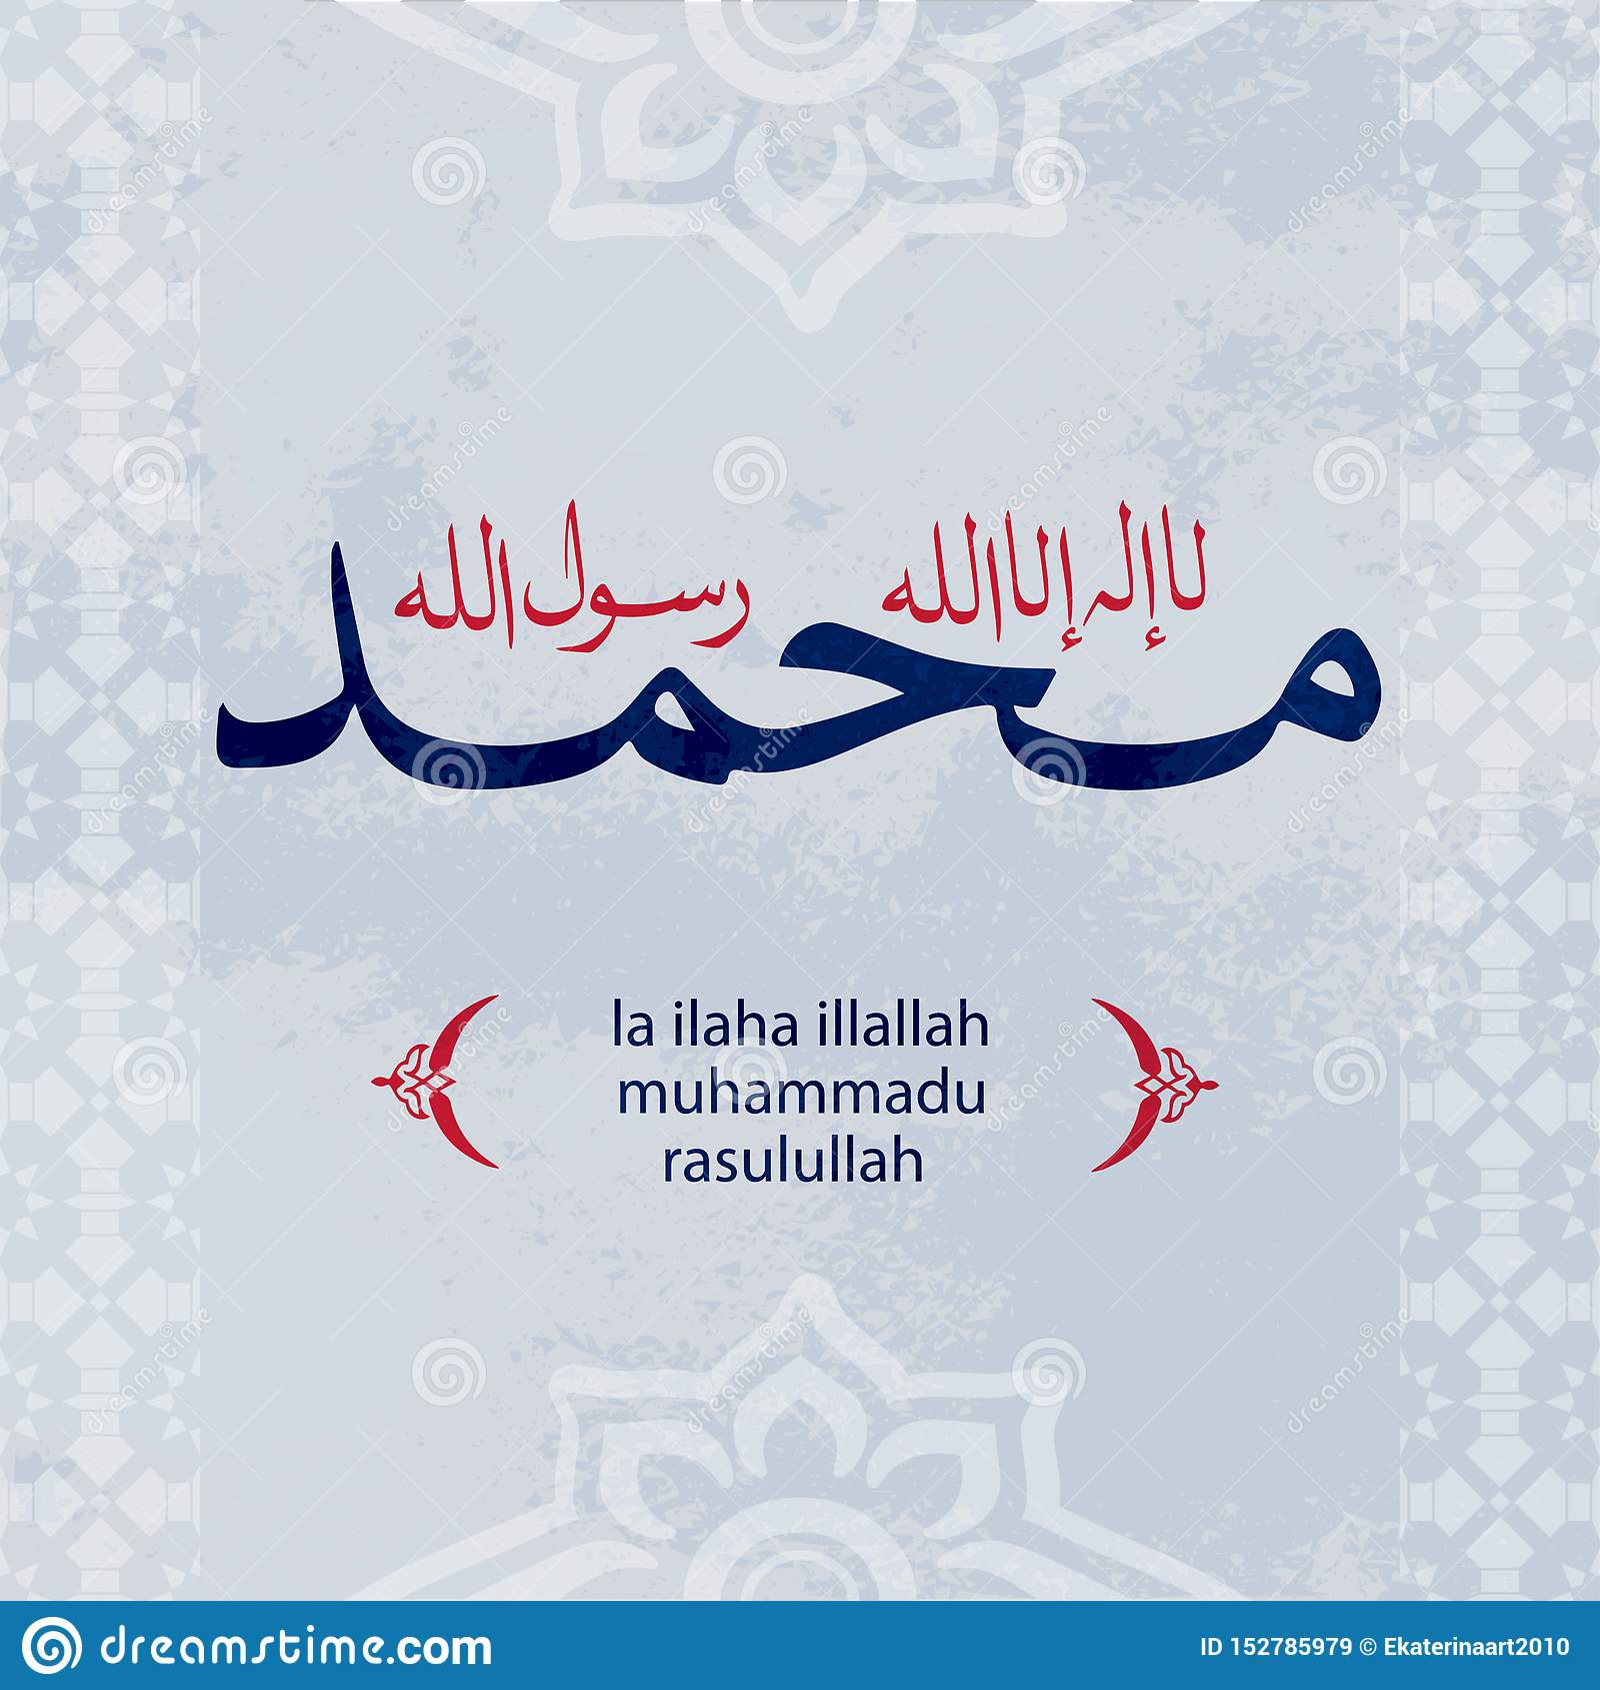 La ilaha illallah穆罕默杜rasulullah - shahada